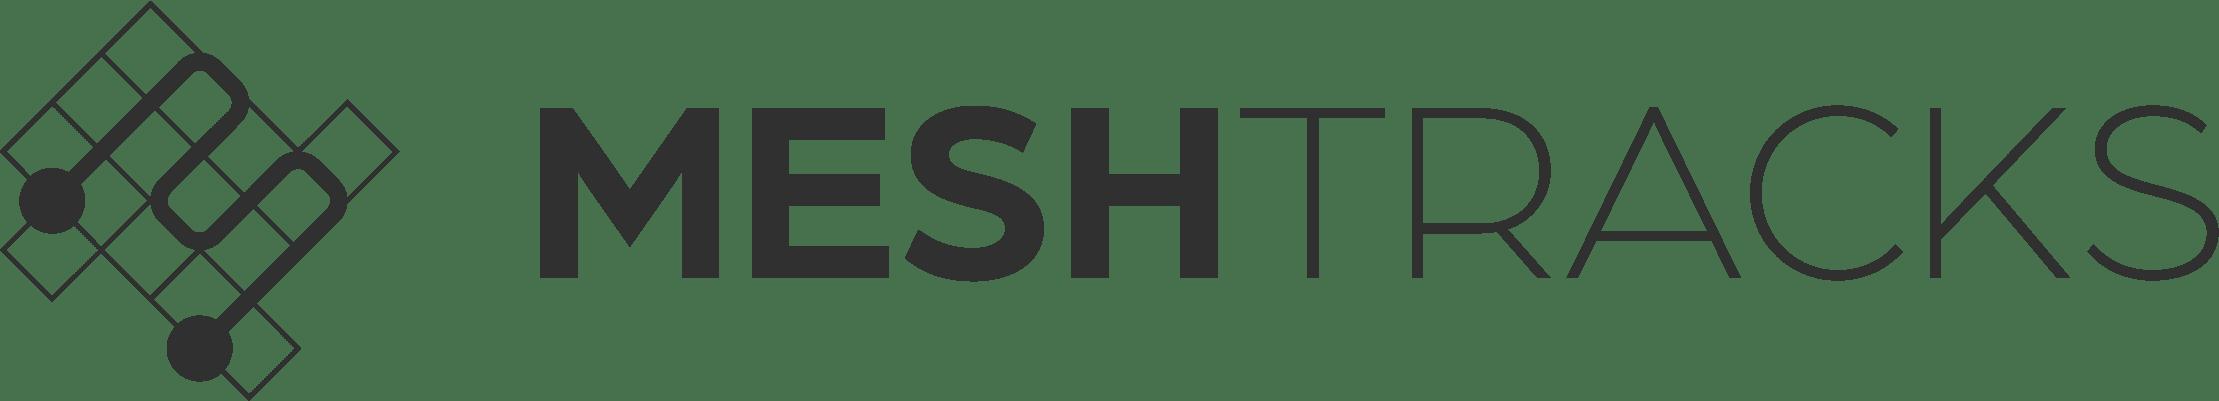 MESHTracks Fleet Tracking Software